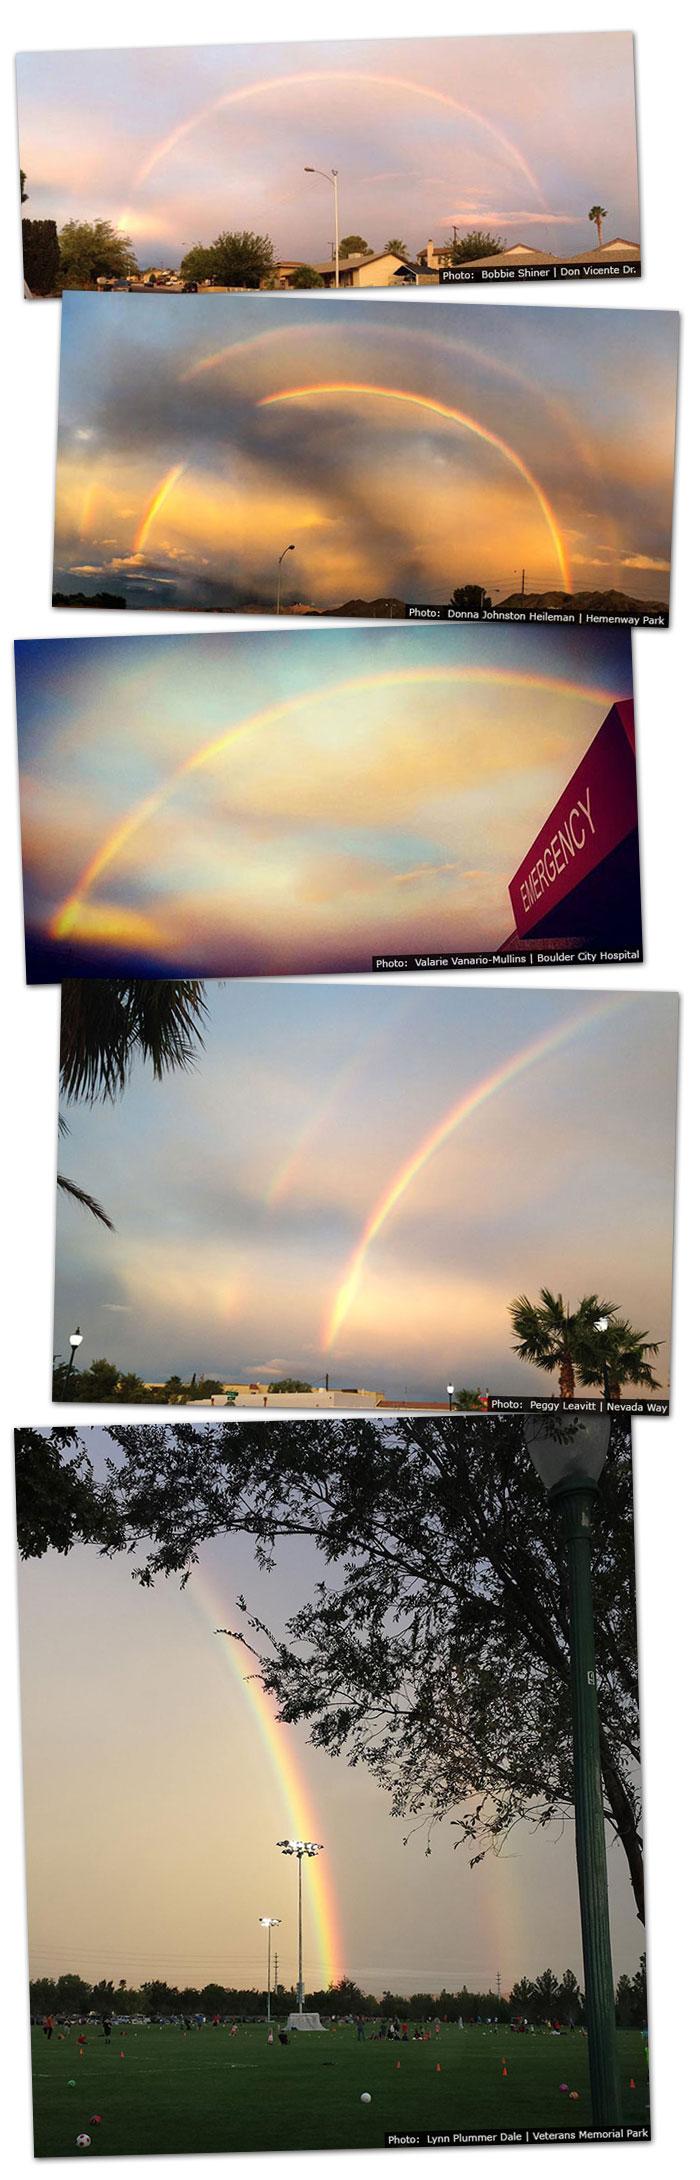 Rainbows in Boulder City, Nevada